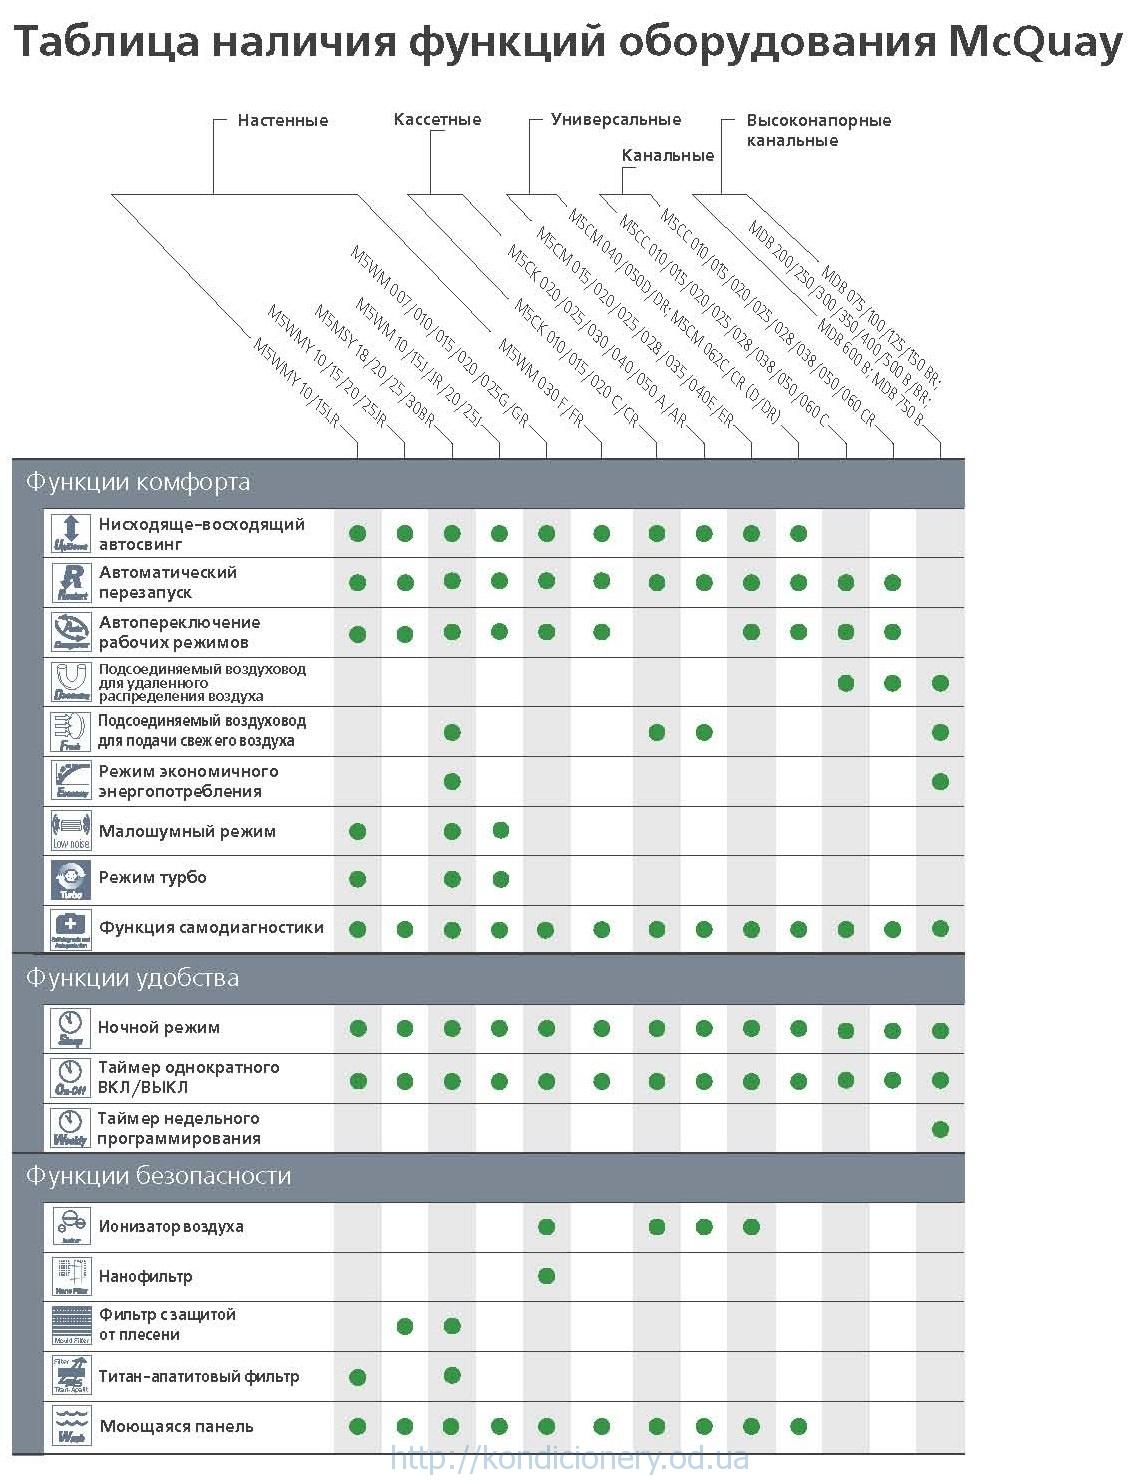 Таблица функций кондиционеров McQuay